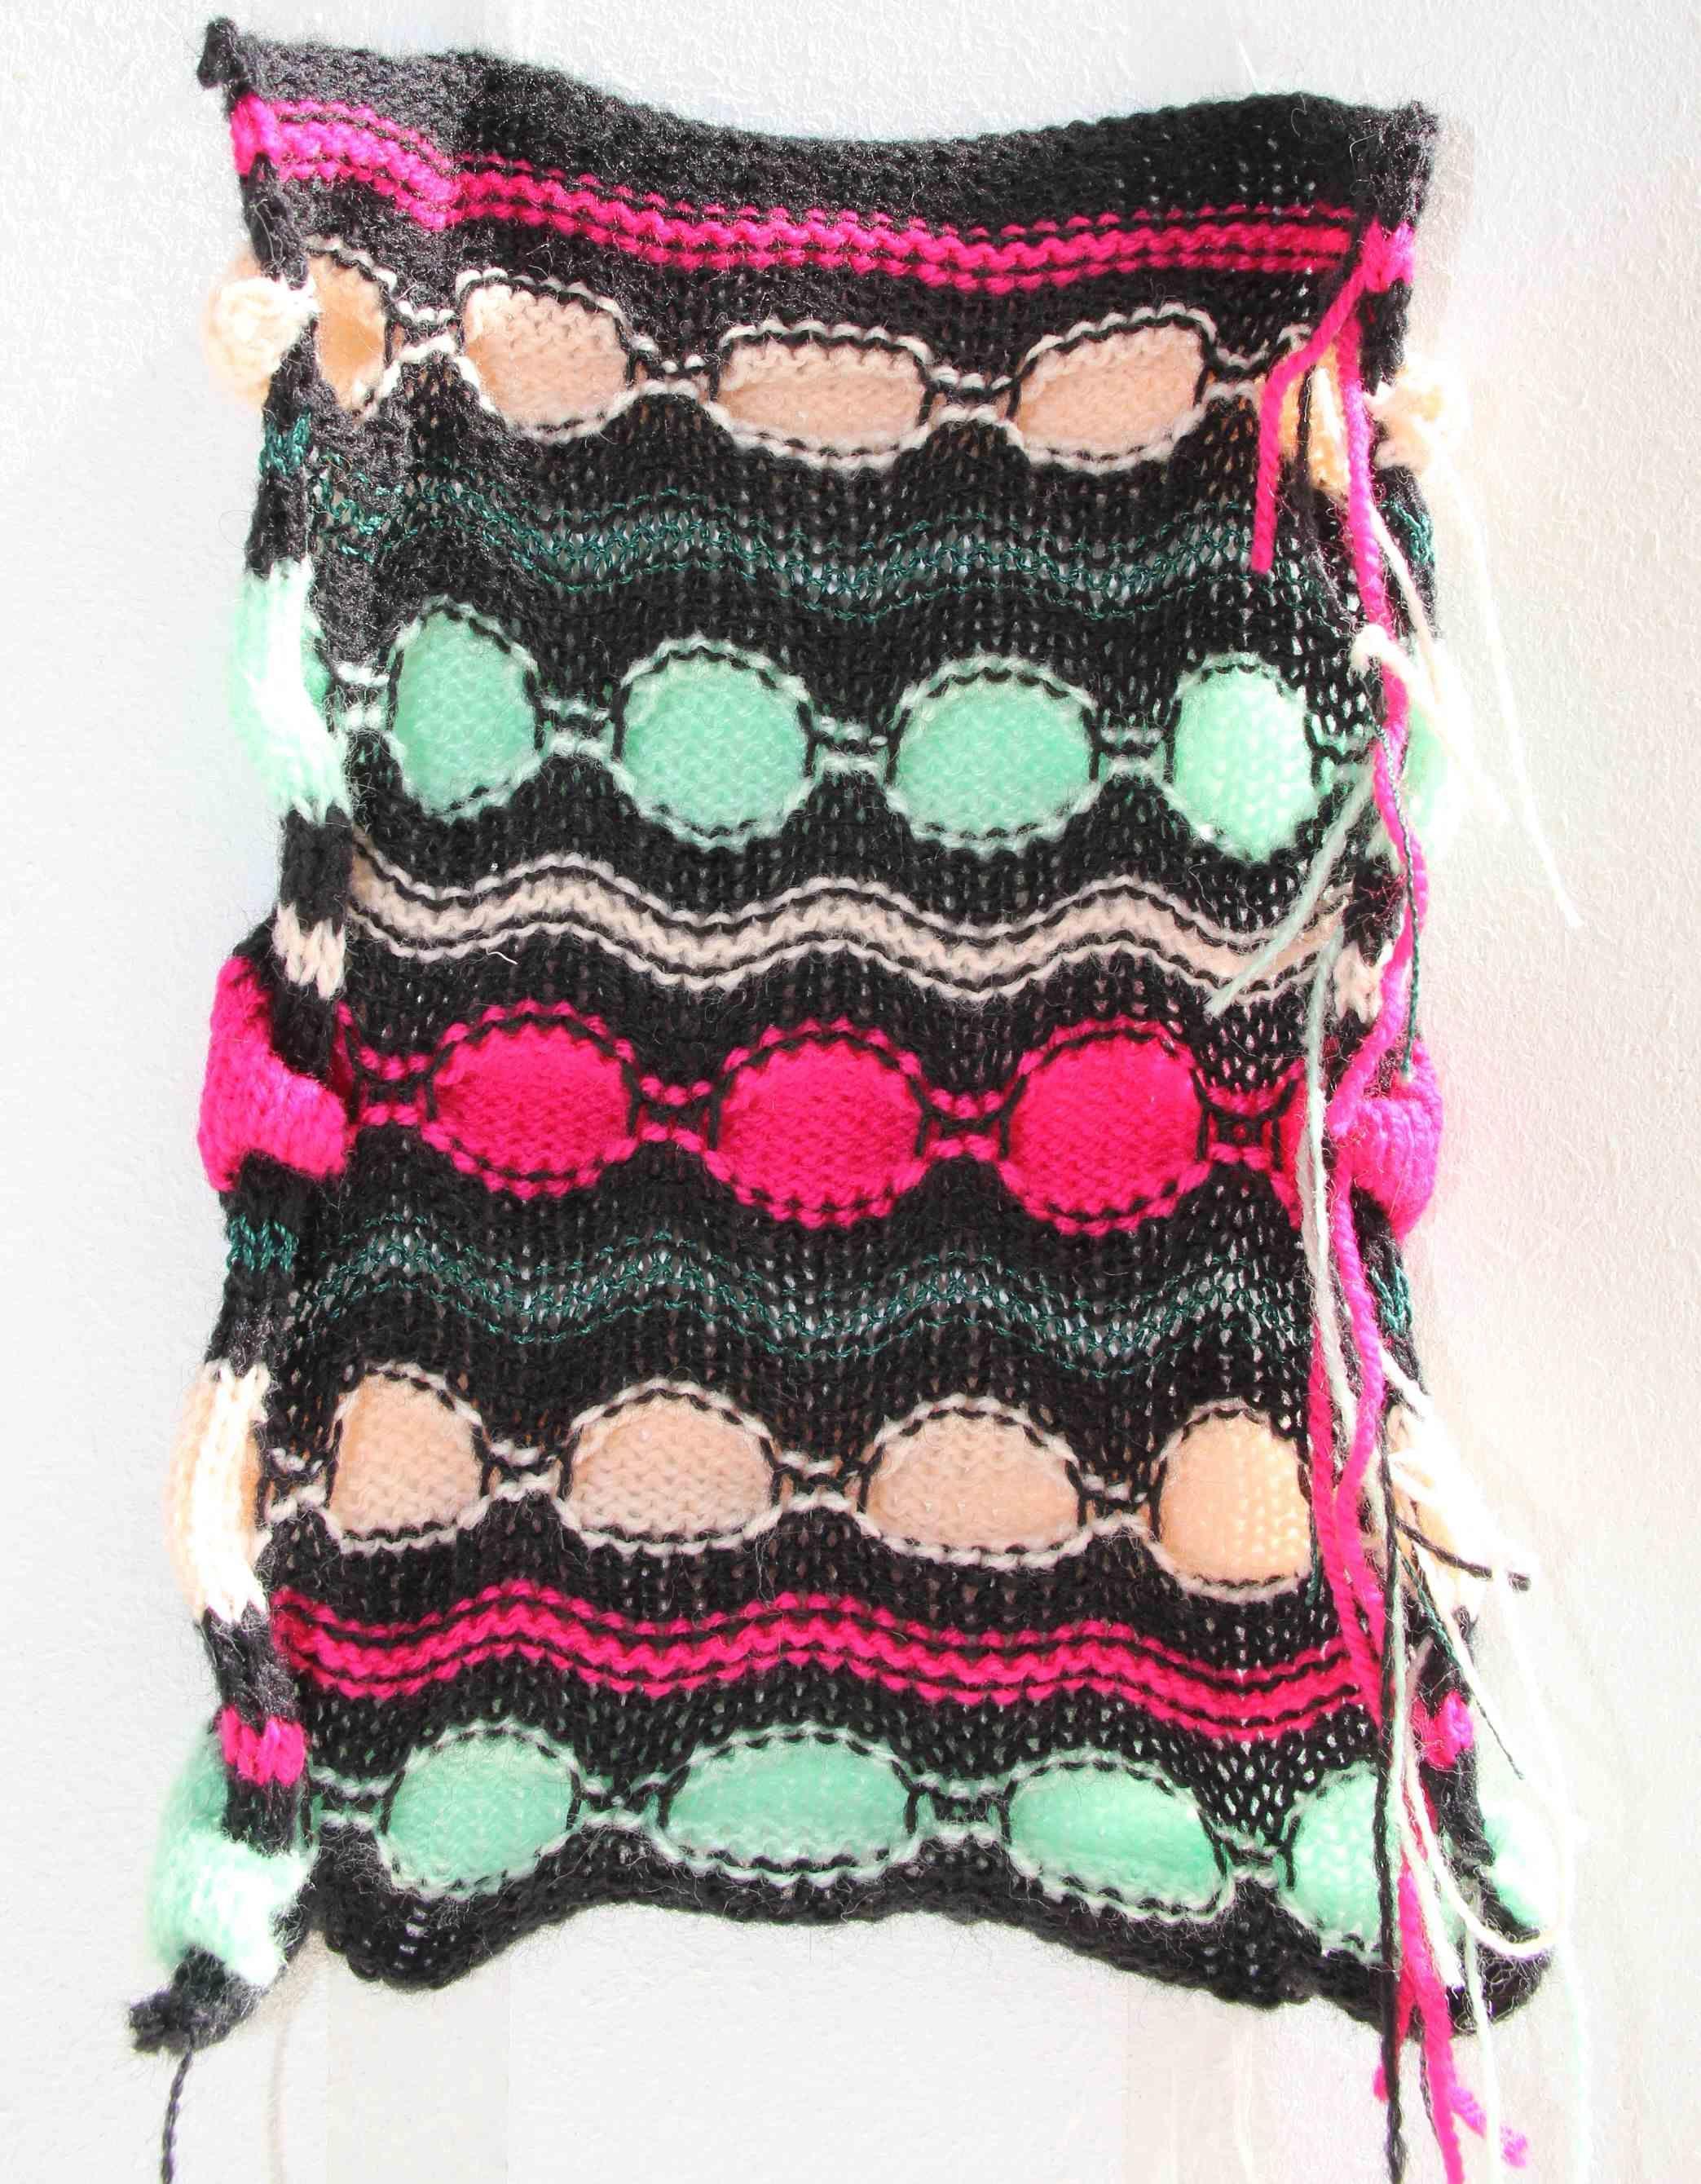 Colorful Mensstrickschal Muster Gift - Decke Stricken Muster ...